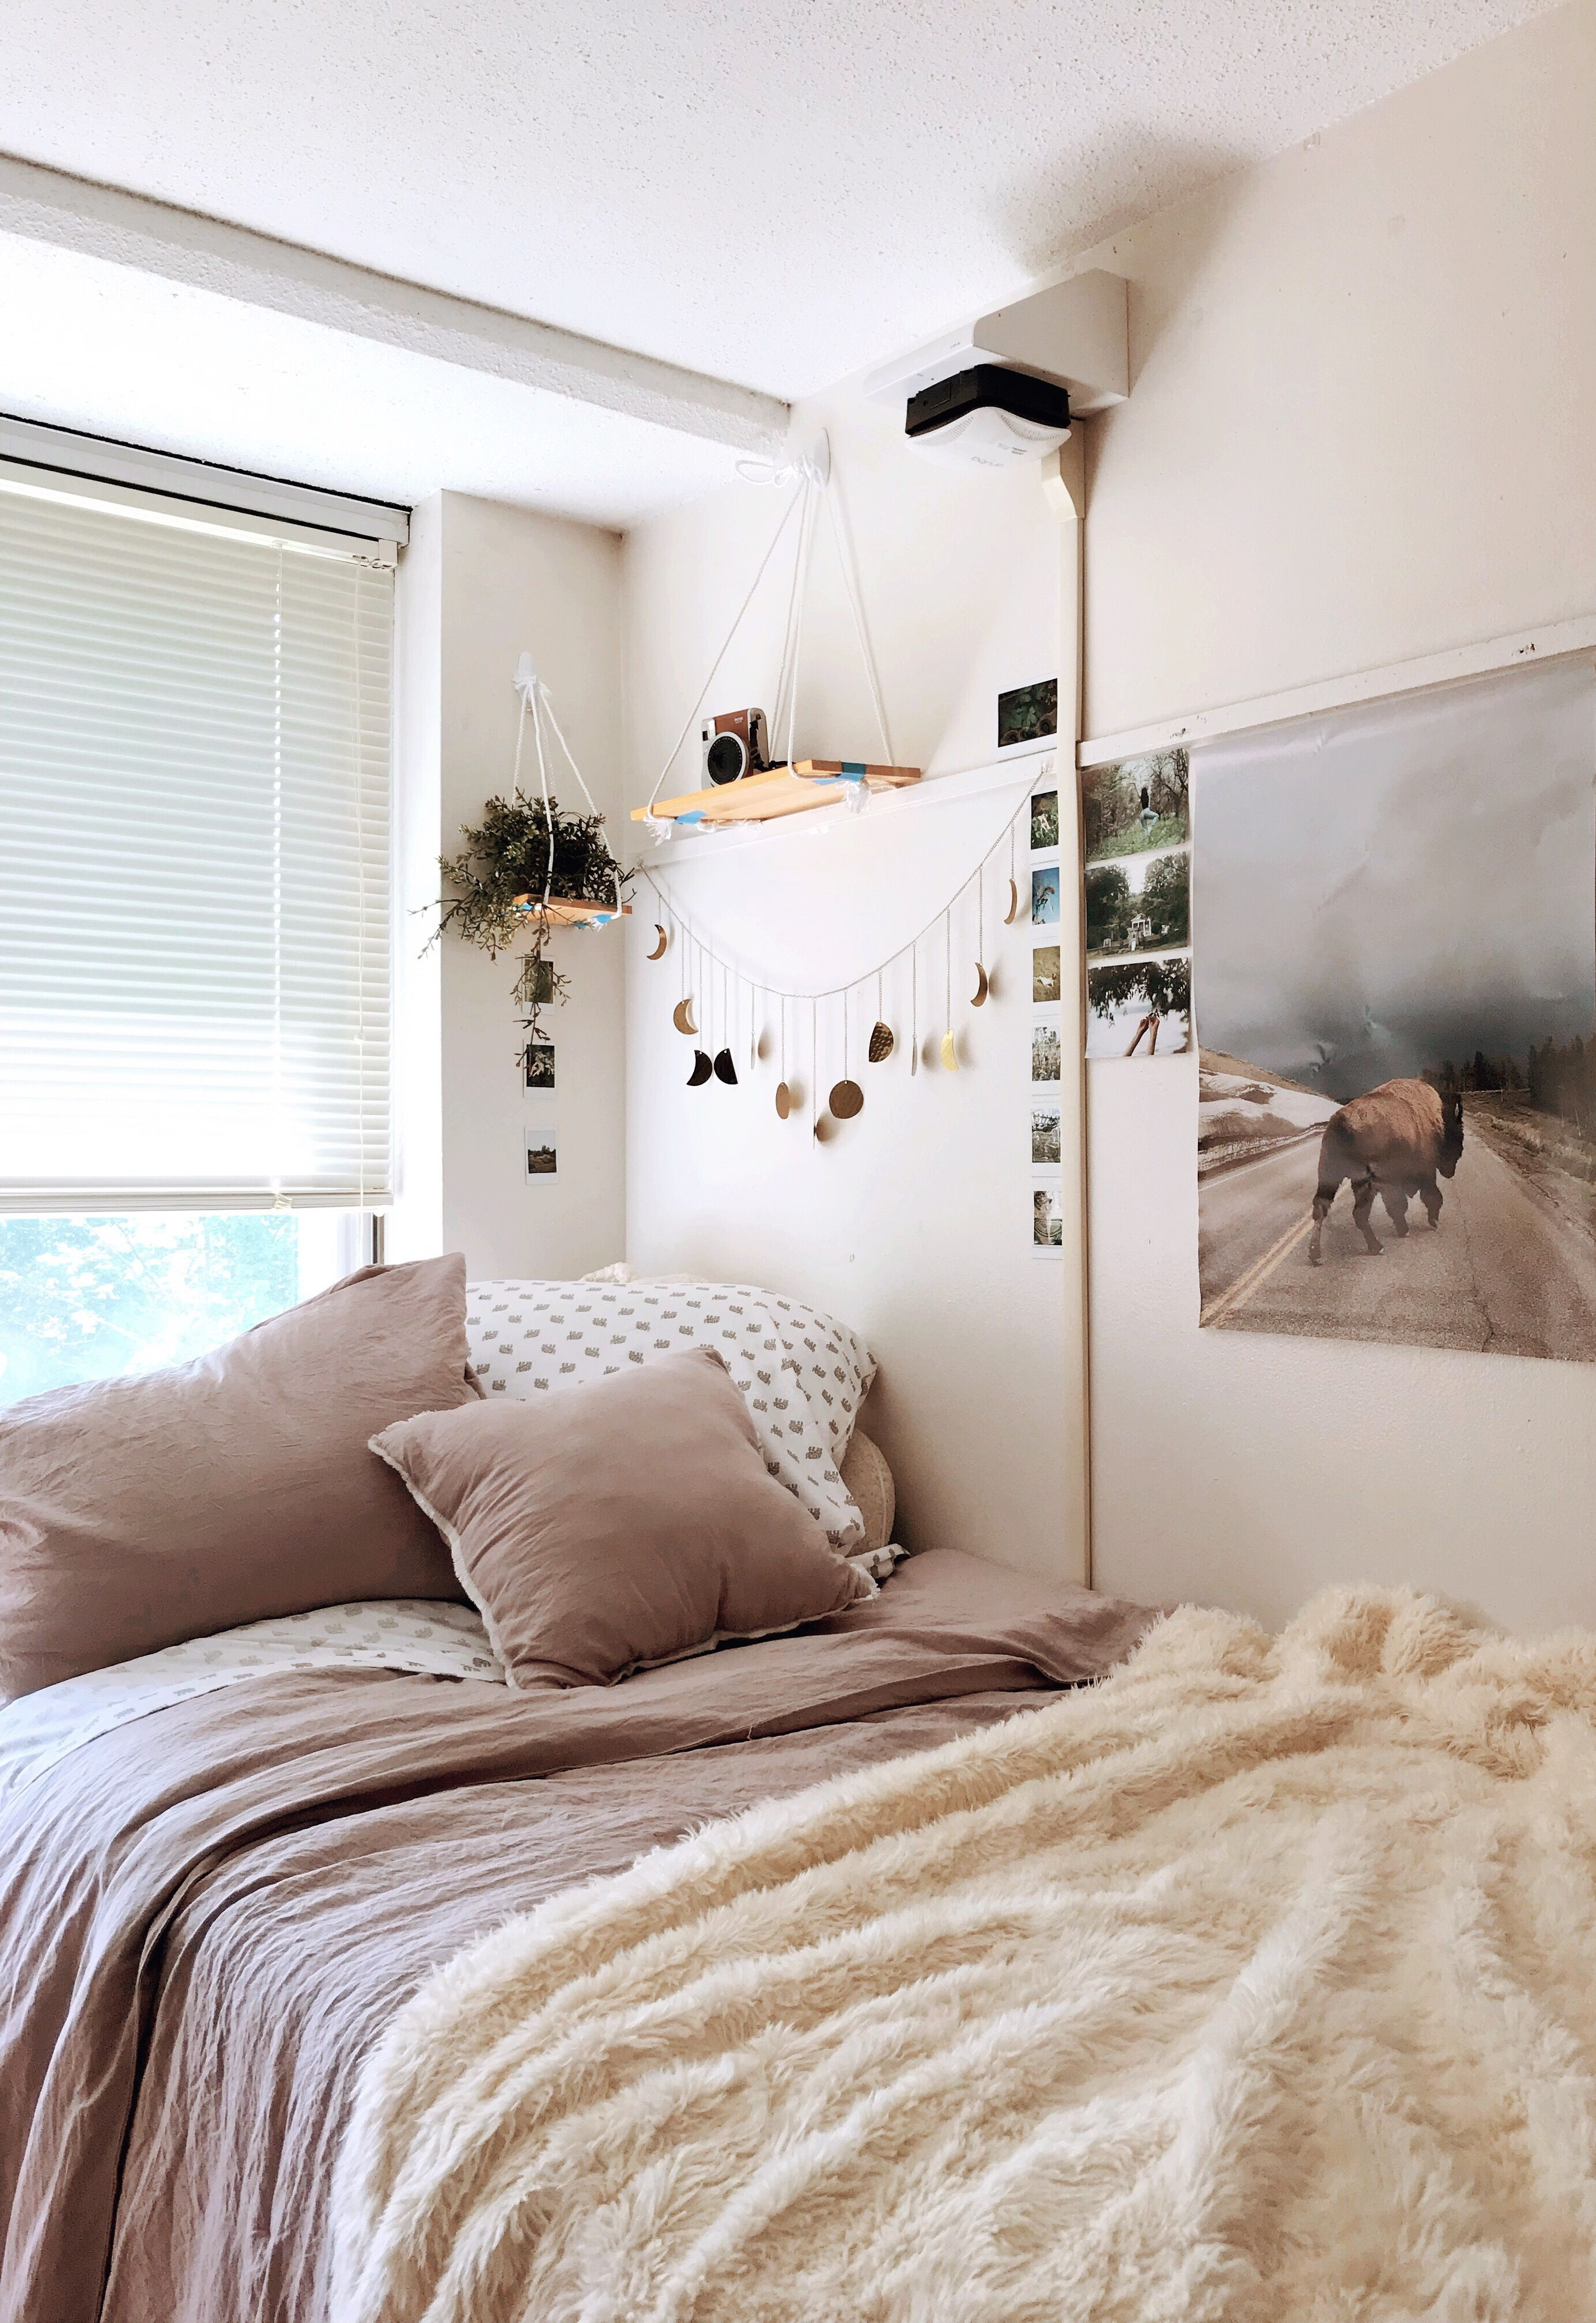 Boho Minimal Dorm Room Inspired By Urban Outfitters Color Scheme Boho Dorm Room Bedroom Color Schemes Dorm Room Inspiration